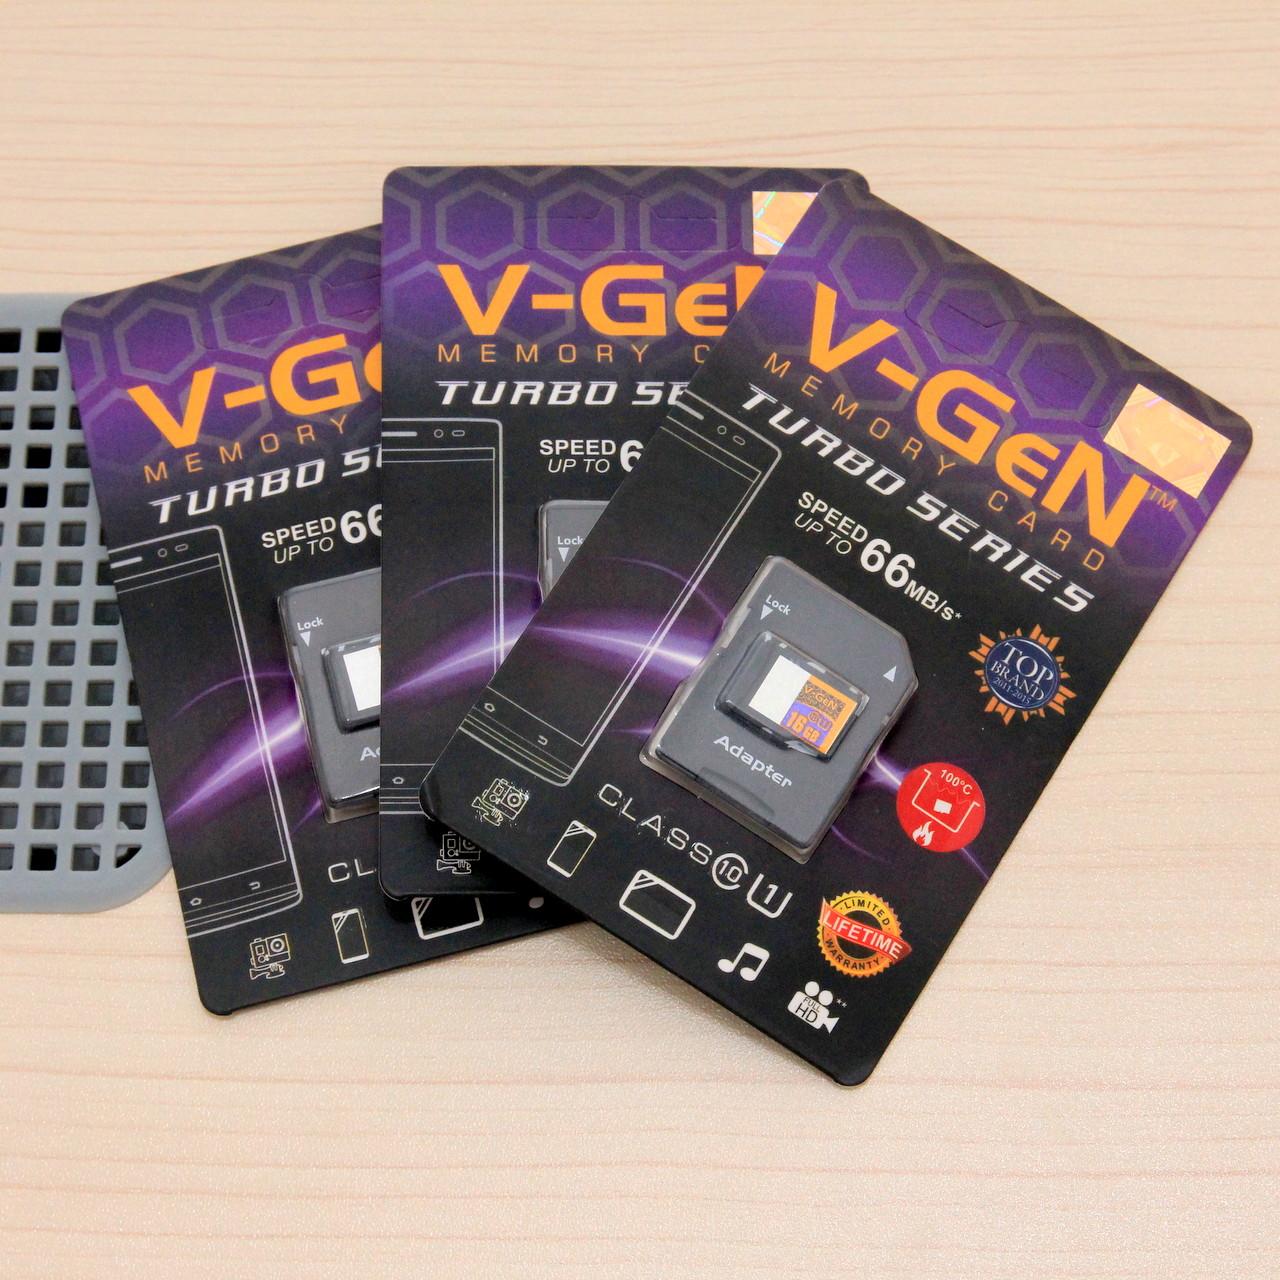 V Gen Micro Sd Memory Card 32 Gb Class 10 Daftar Harga Terlengkap 8gb Turbo Adapter Vgen Kelas Tersedia Size 8 16